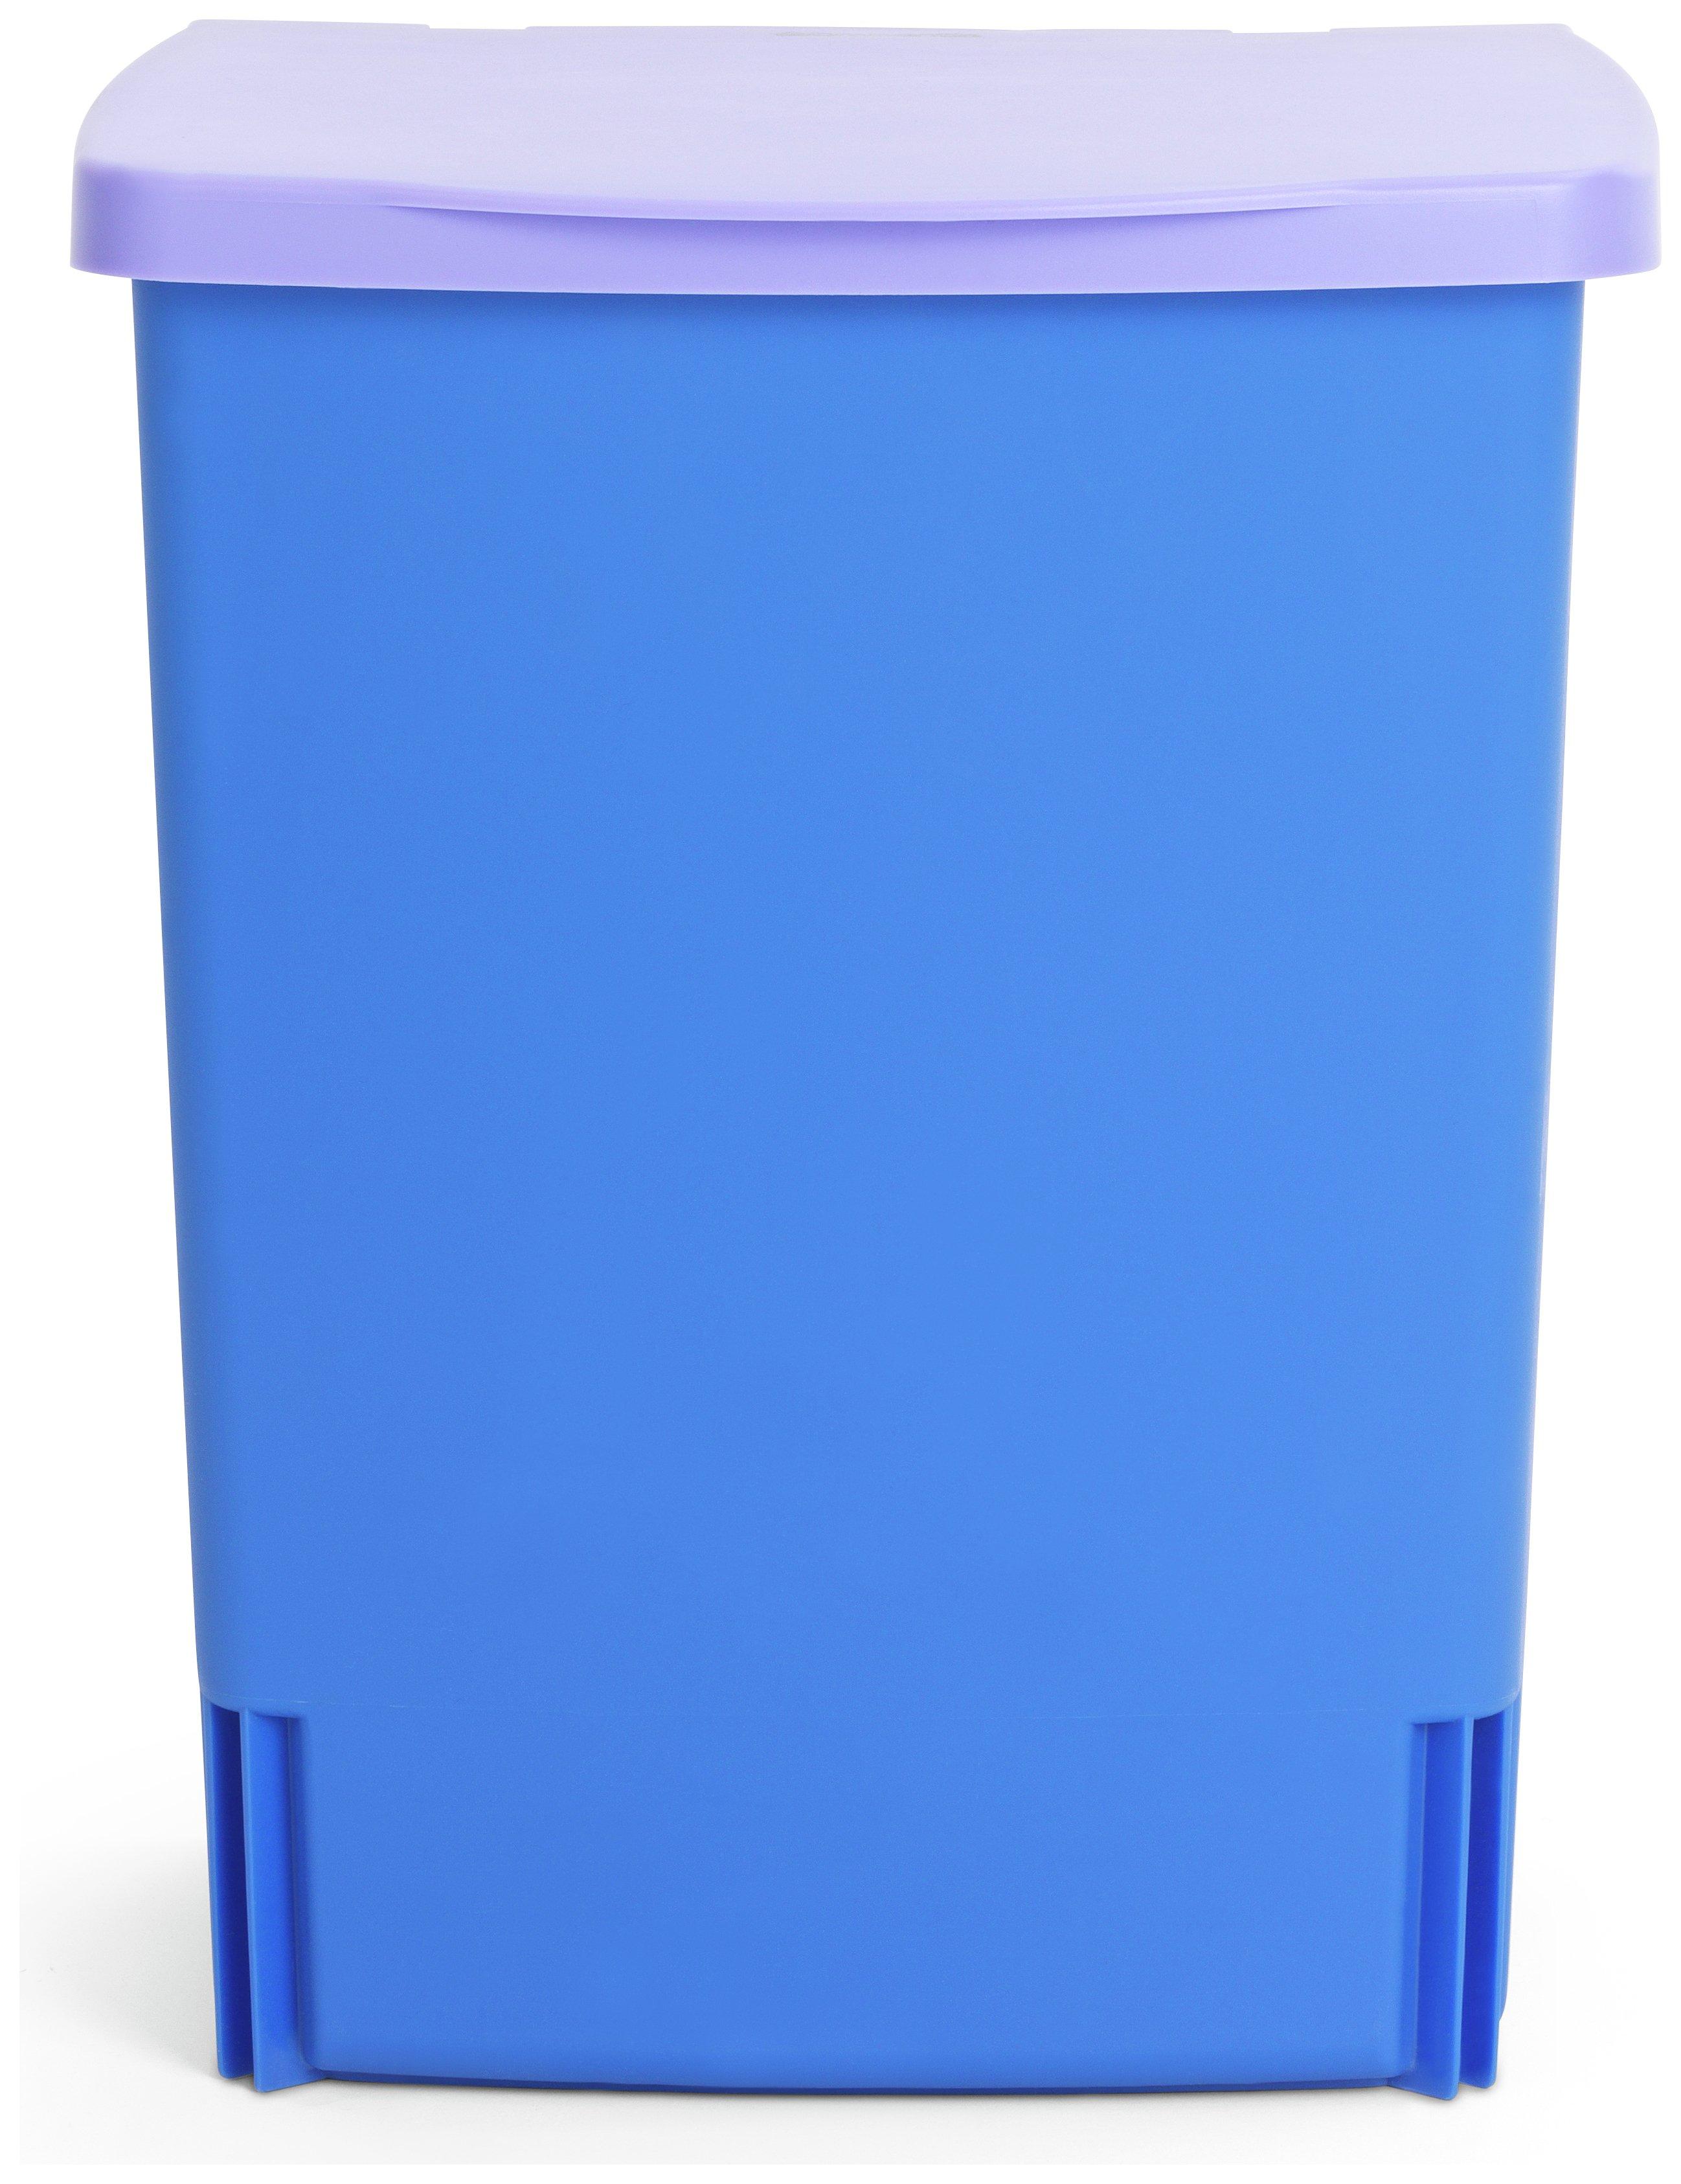 Image of Brabantia - 10L Waste / Storage Binny - Lavender